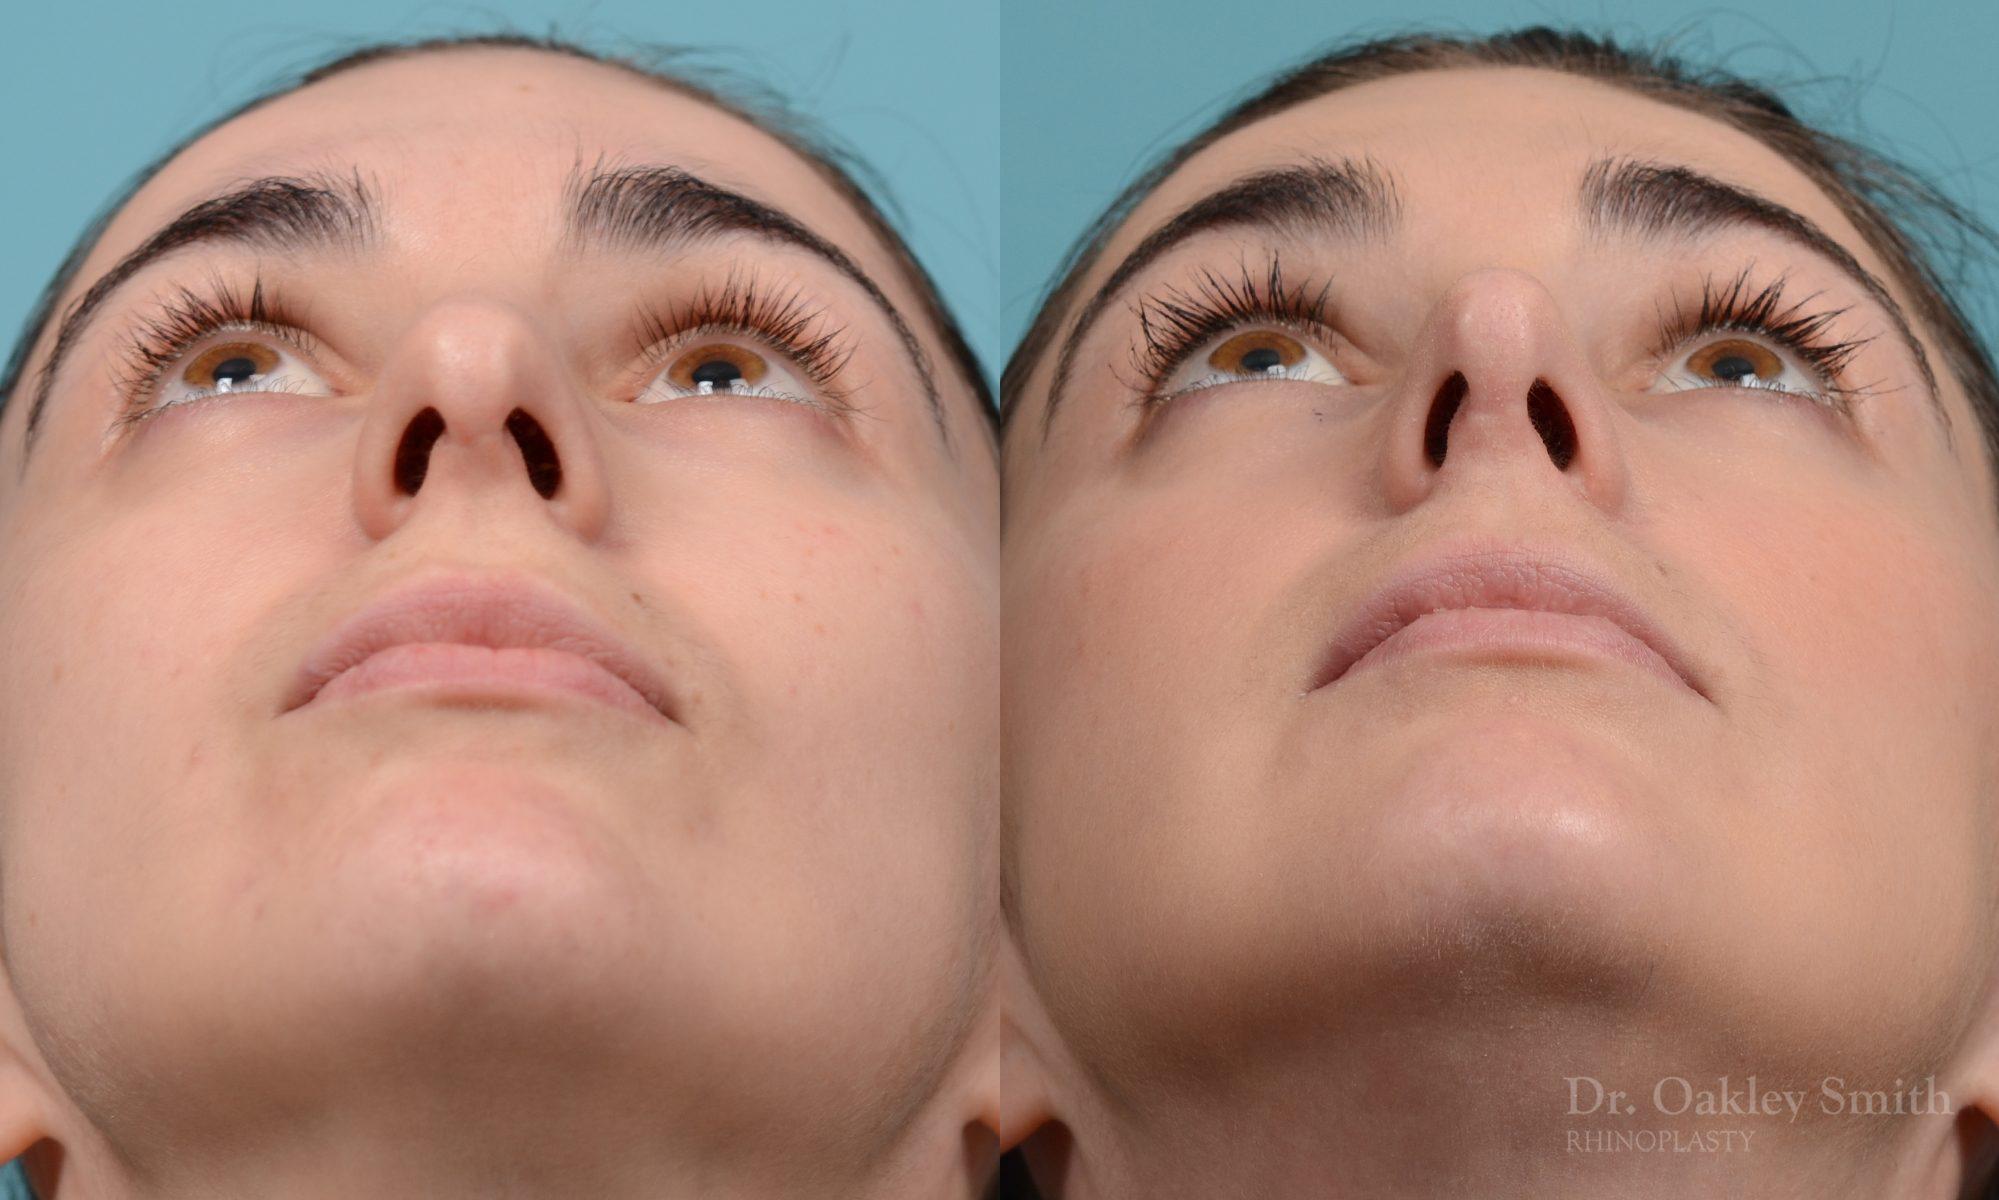 Revision rhinoplasty